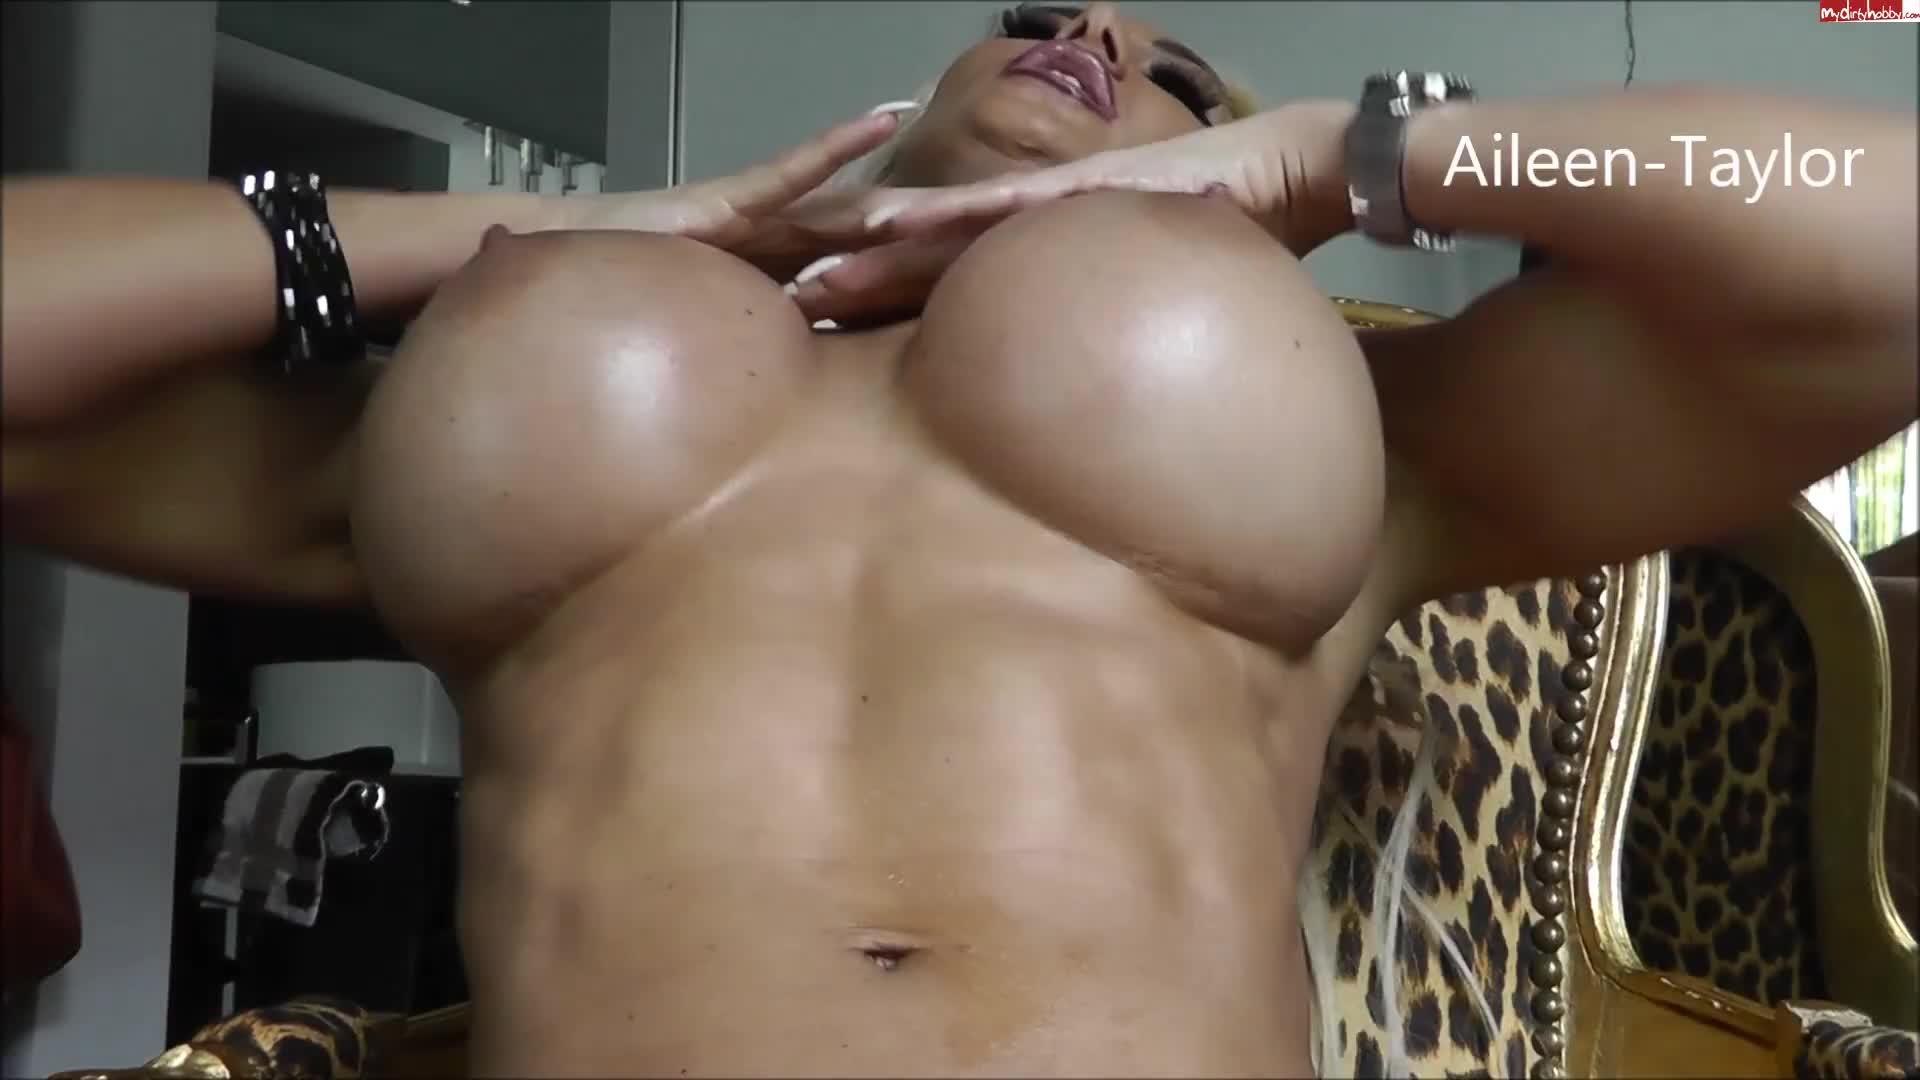 Aileen taylor fucked